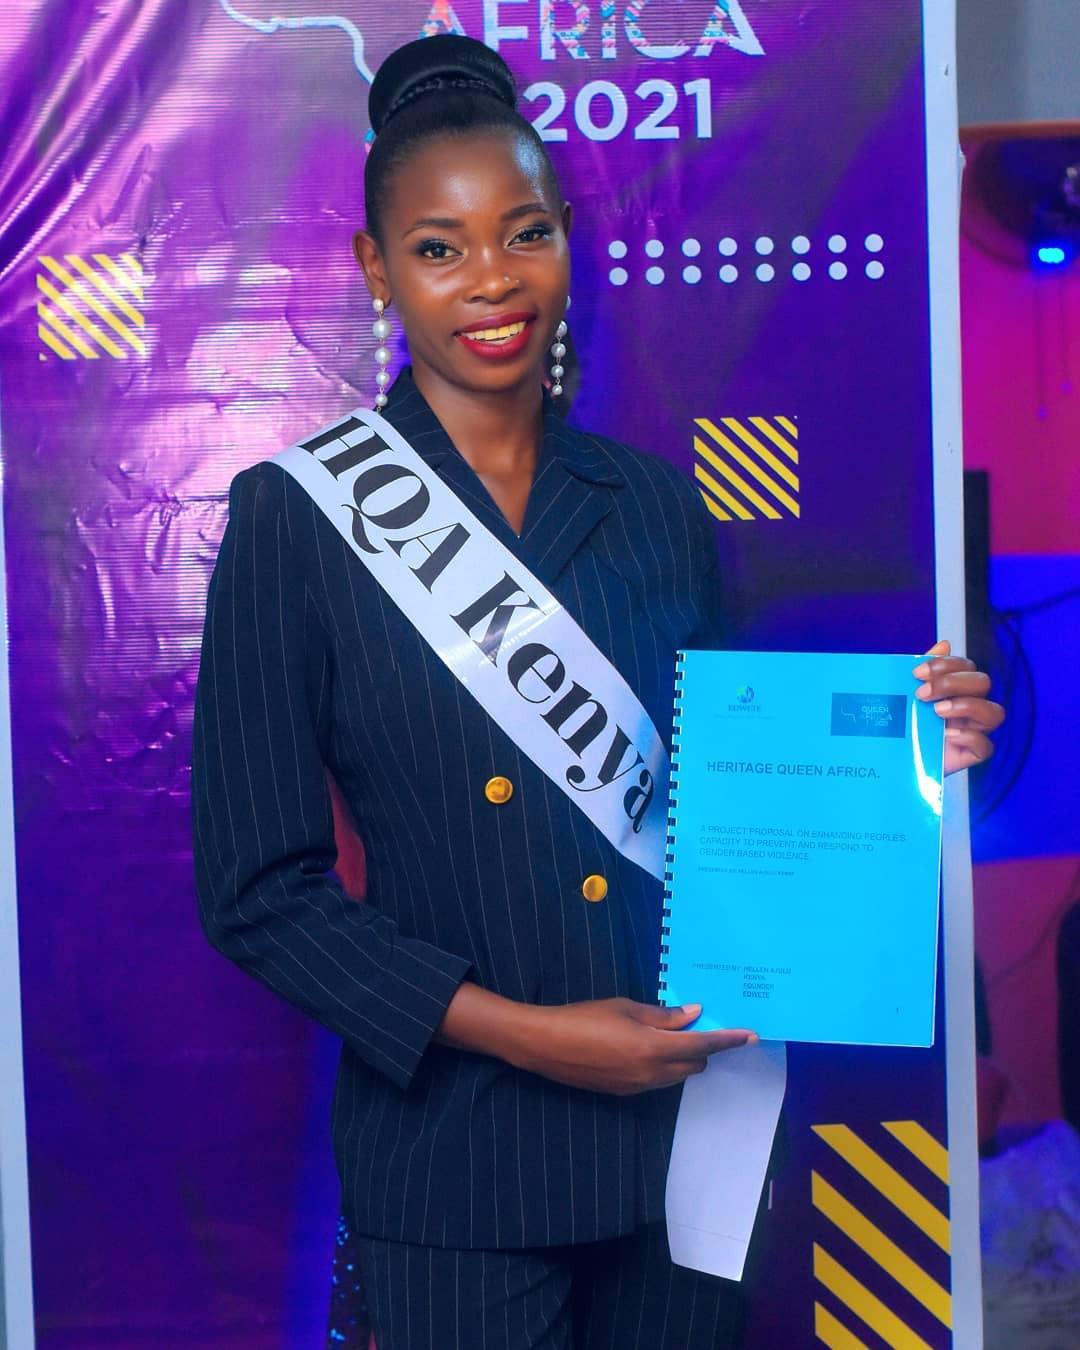 candidatas a heritage queen africa 2021. final: 19 june. - Página 5 NPK30l